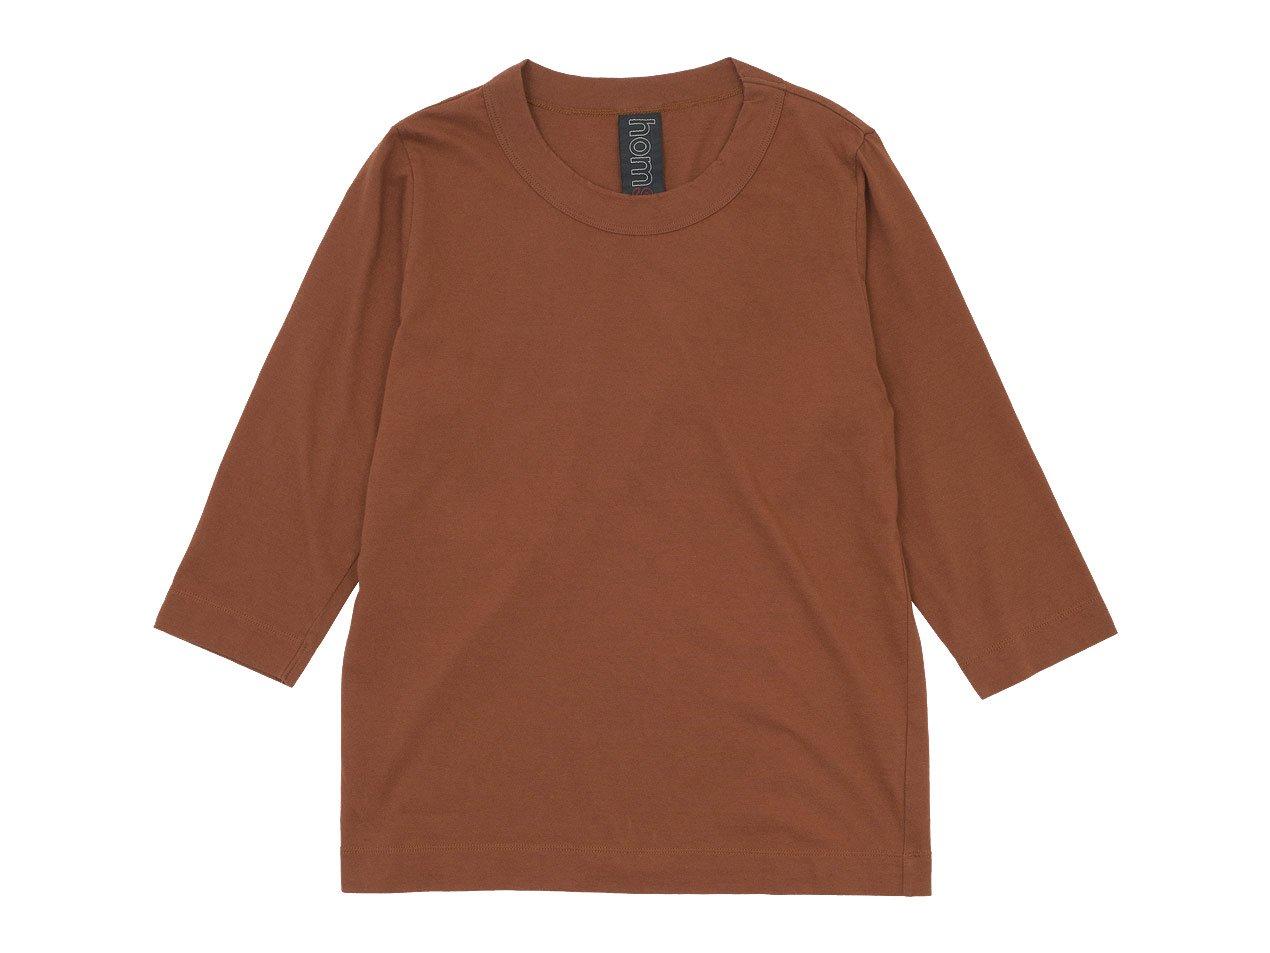 homspun 30/1天竺 七分袖Tシャツ ブラウン